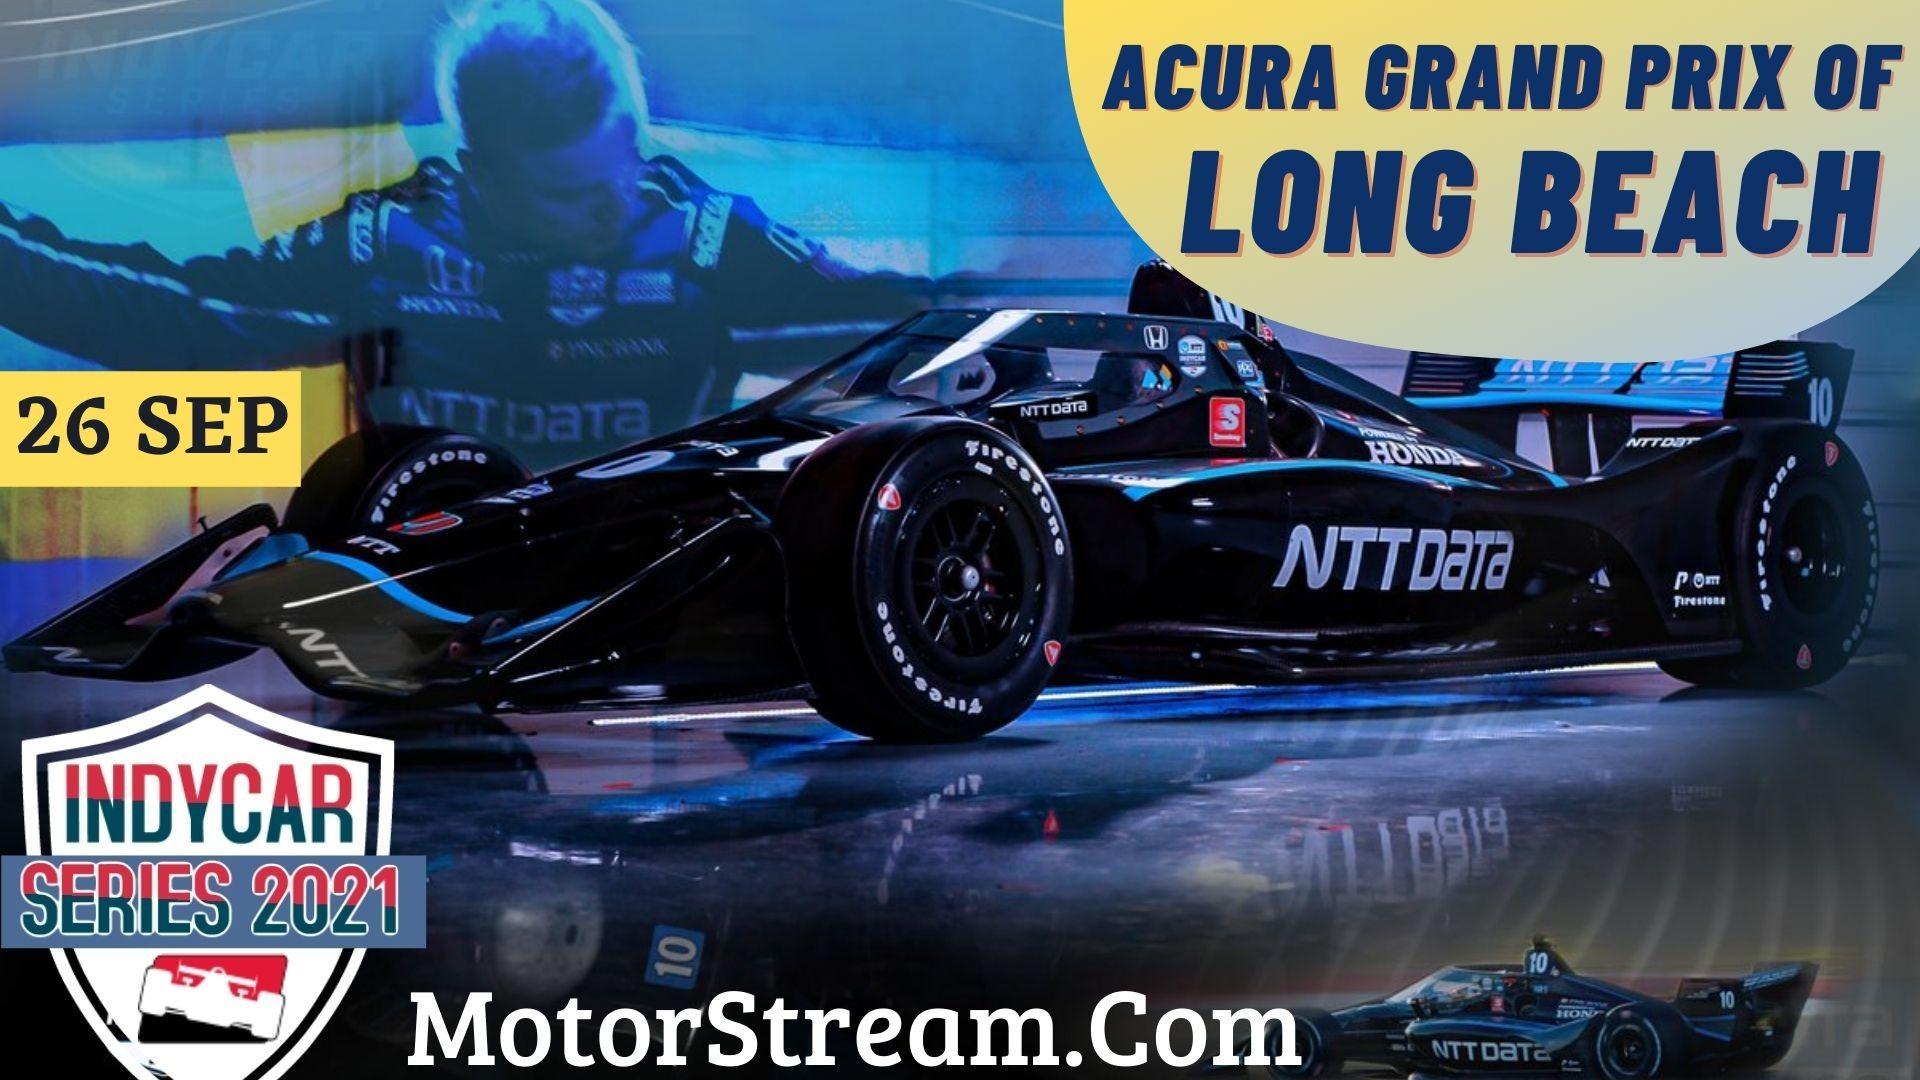 Acura Grand Prix of Long Beach Live Stream 2021